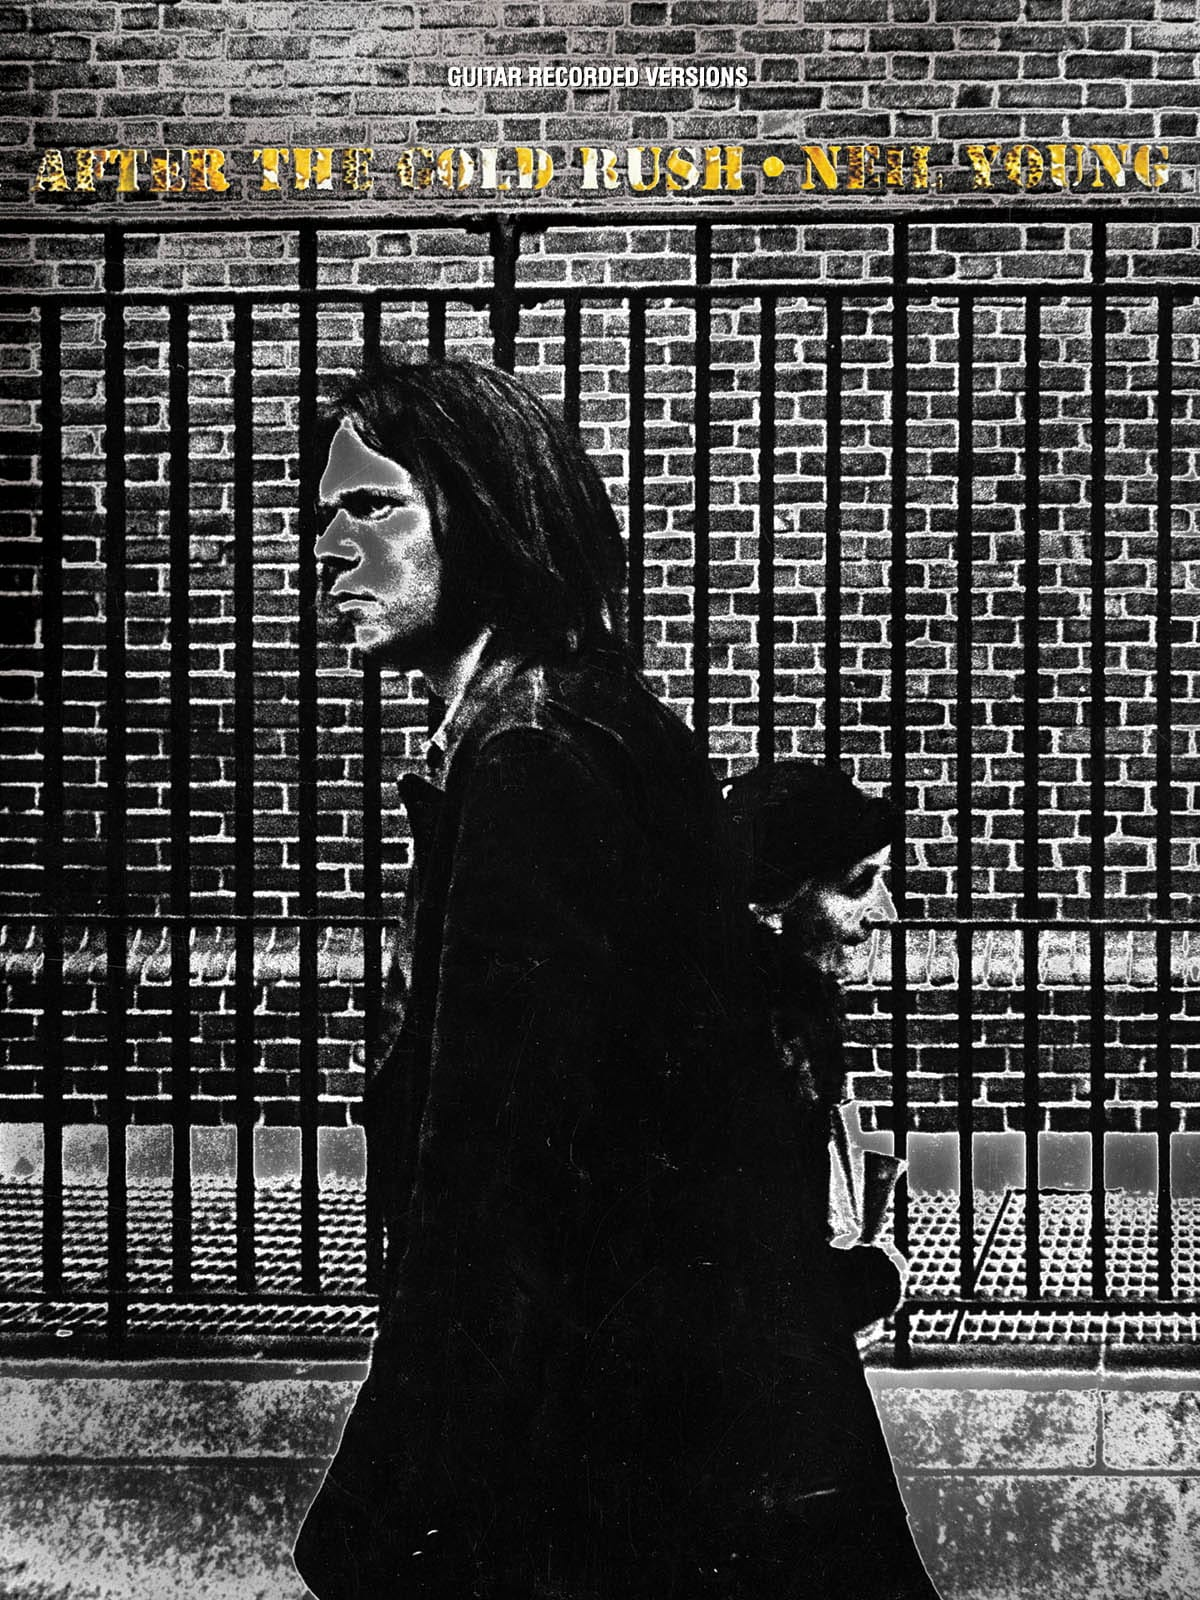 After the goldrush - Neil Young - Partition - laflutedepan.com